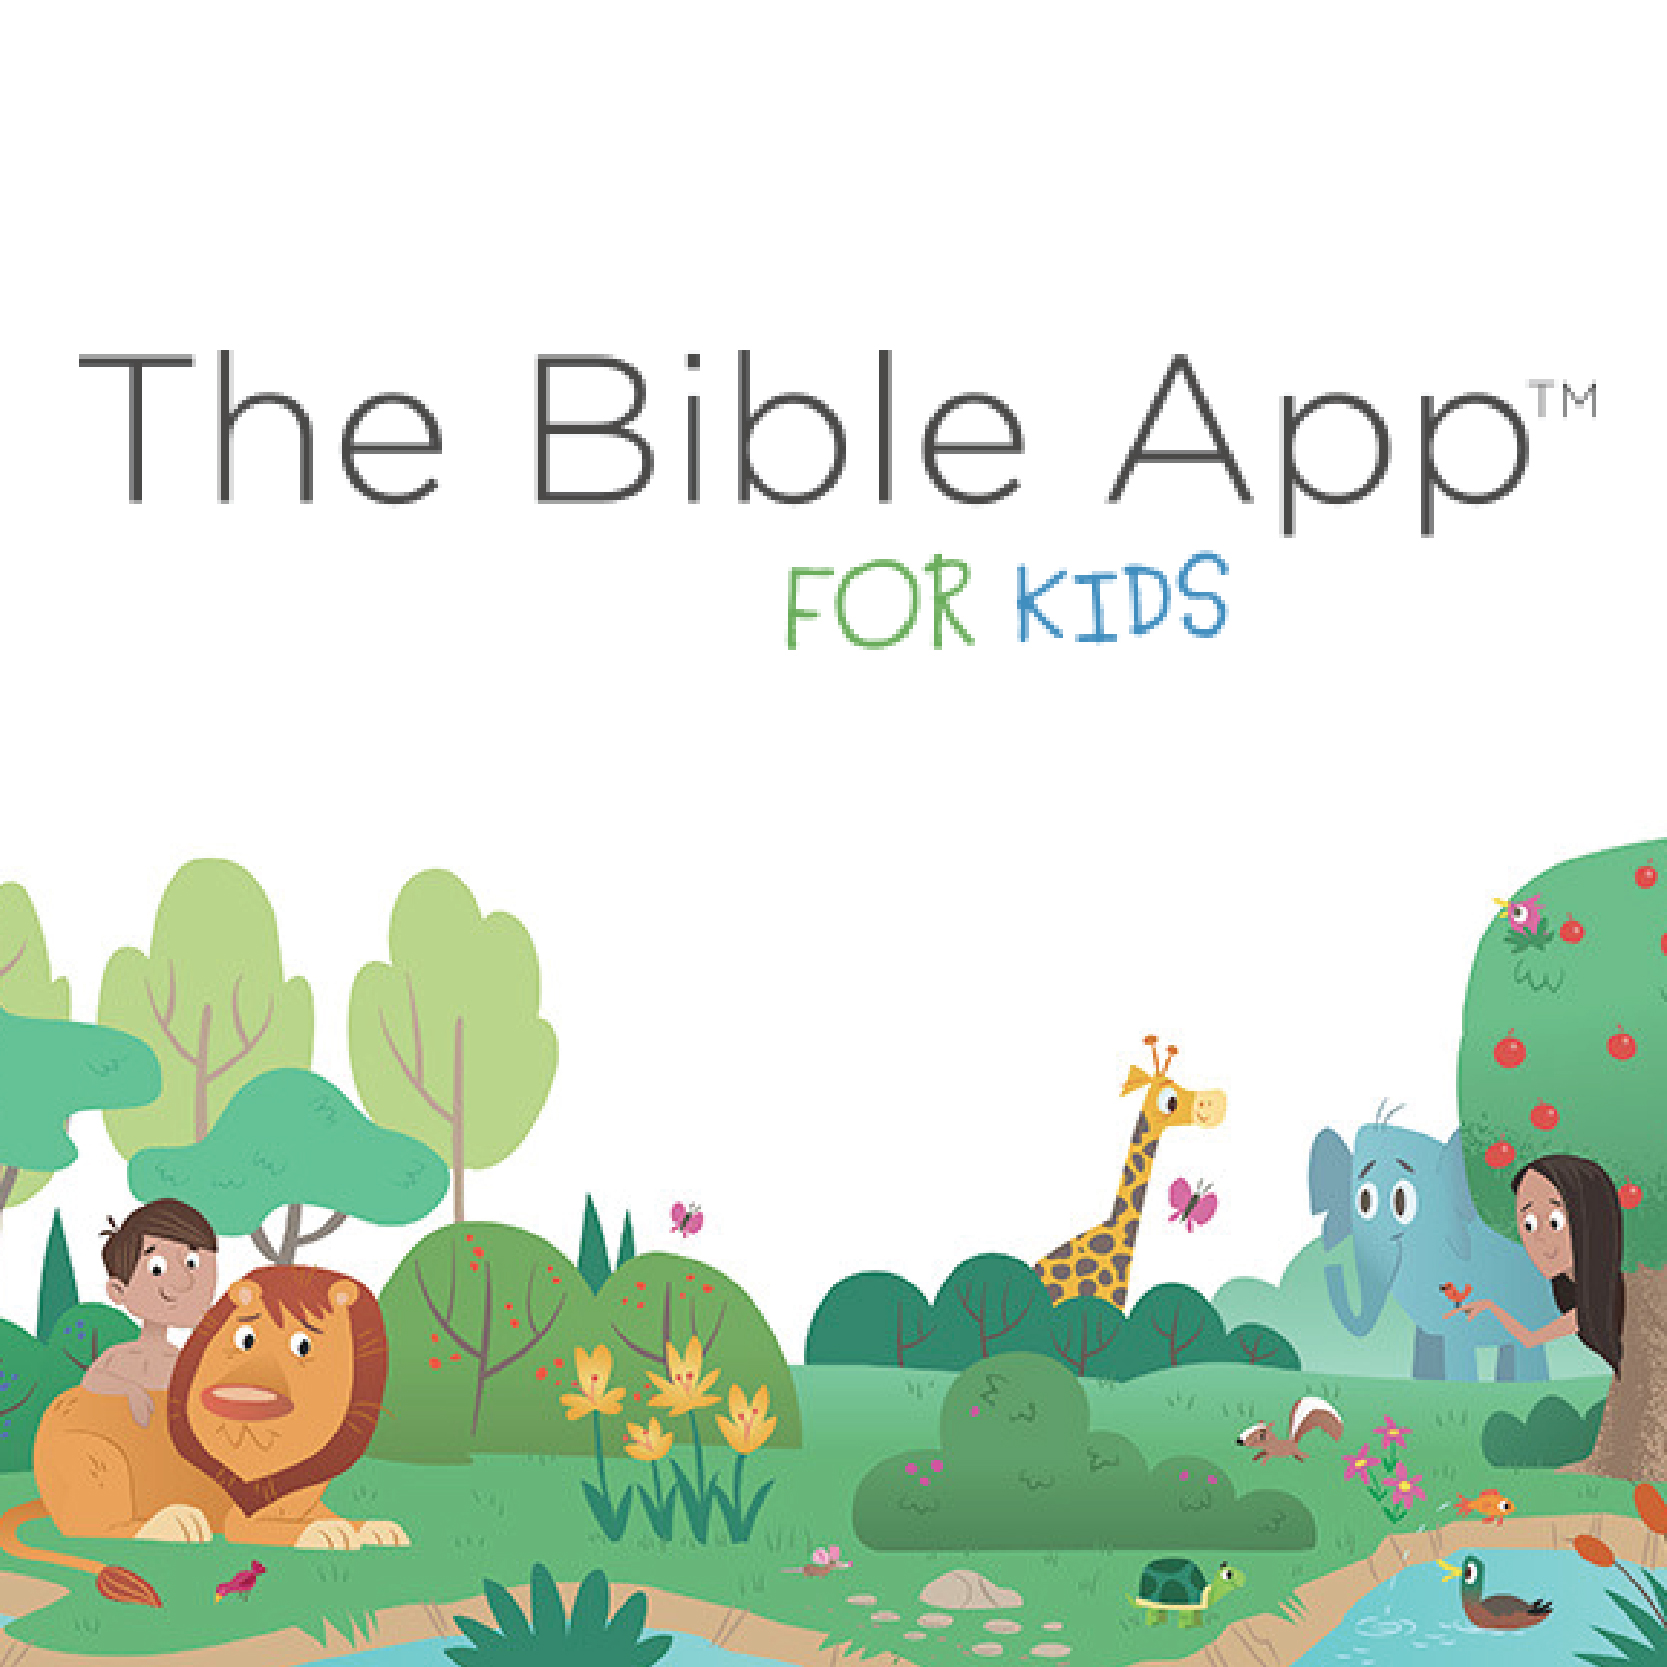 Bible_App_For_Kids_Thumbnail_157x157.jpg